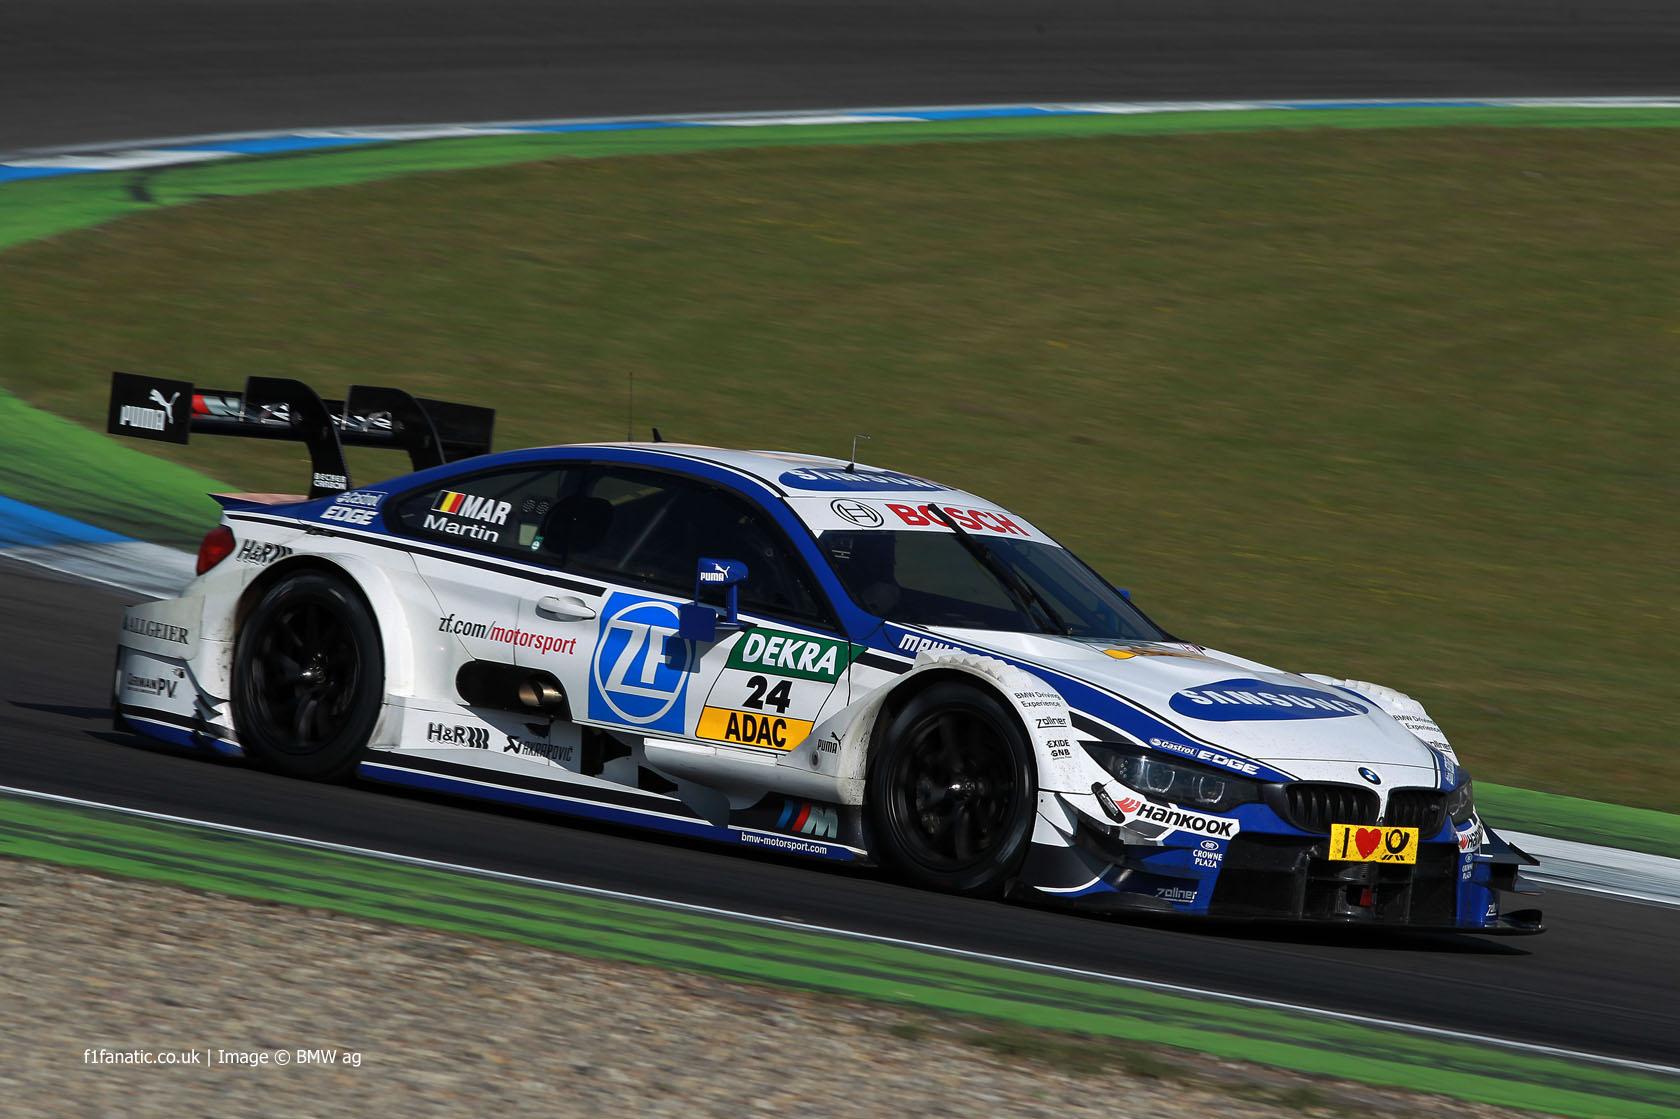 Maxime Martin Bmw M4 Dtm 2014 F1 Fanatic